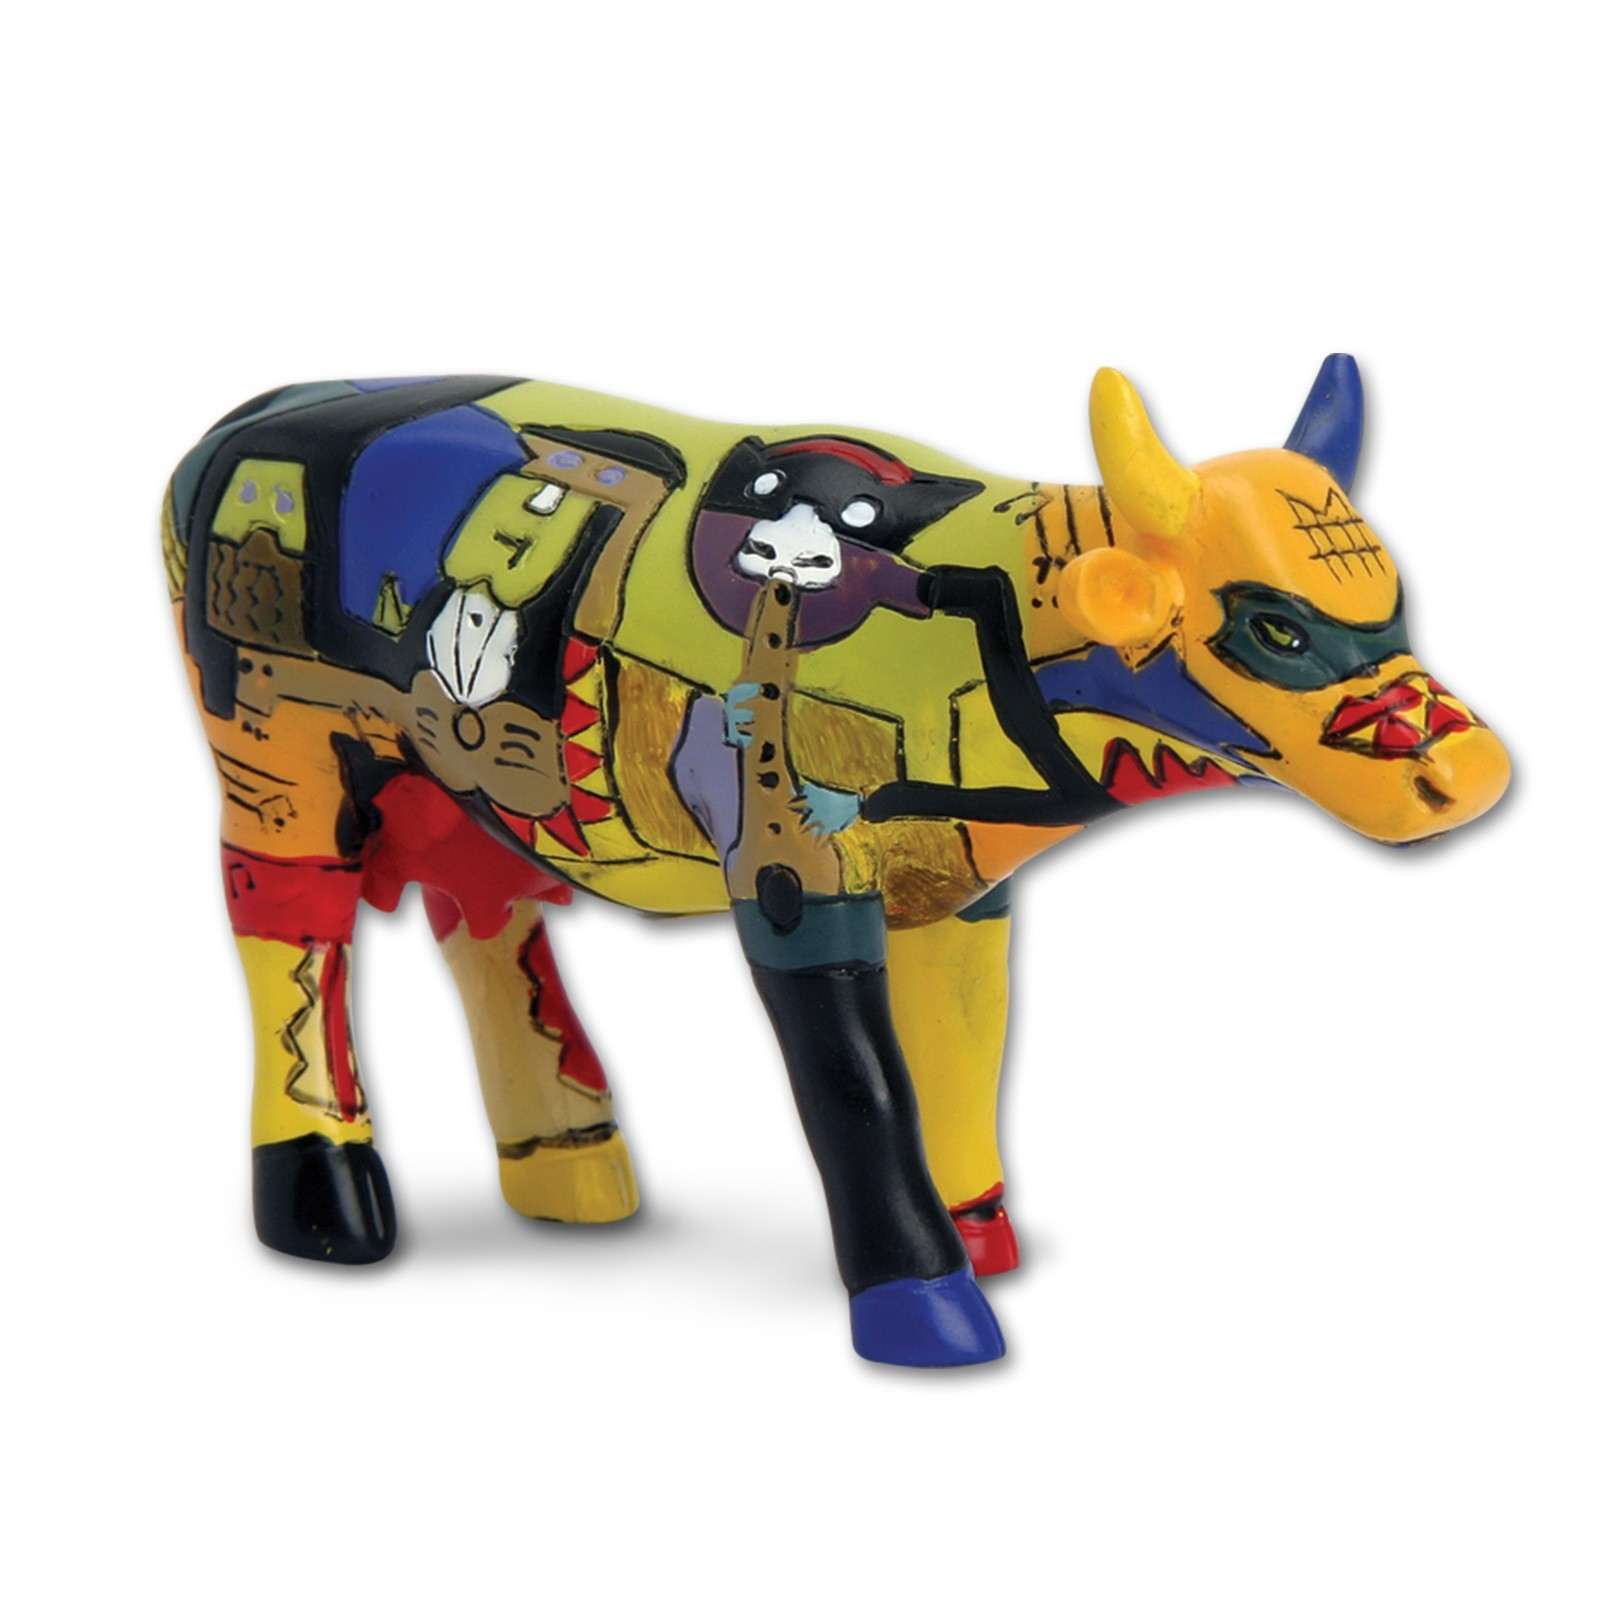 Design Kuh mit Picasso Musiker 4,5cm Köthen Kuhparade KOS001